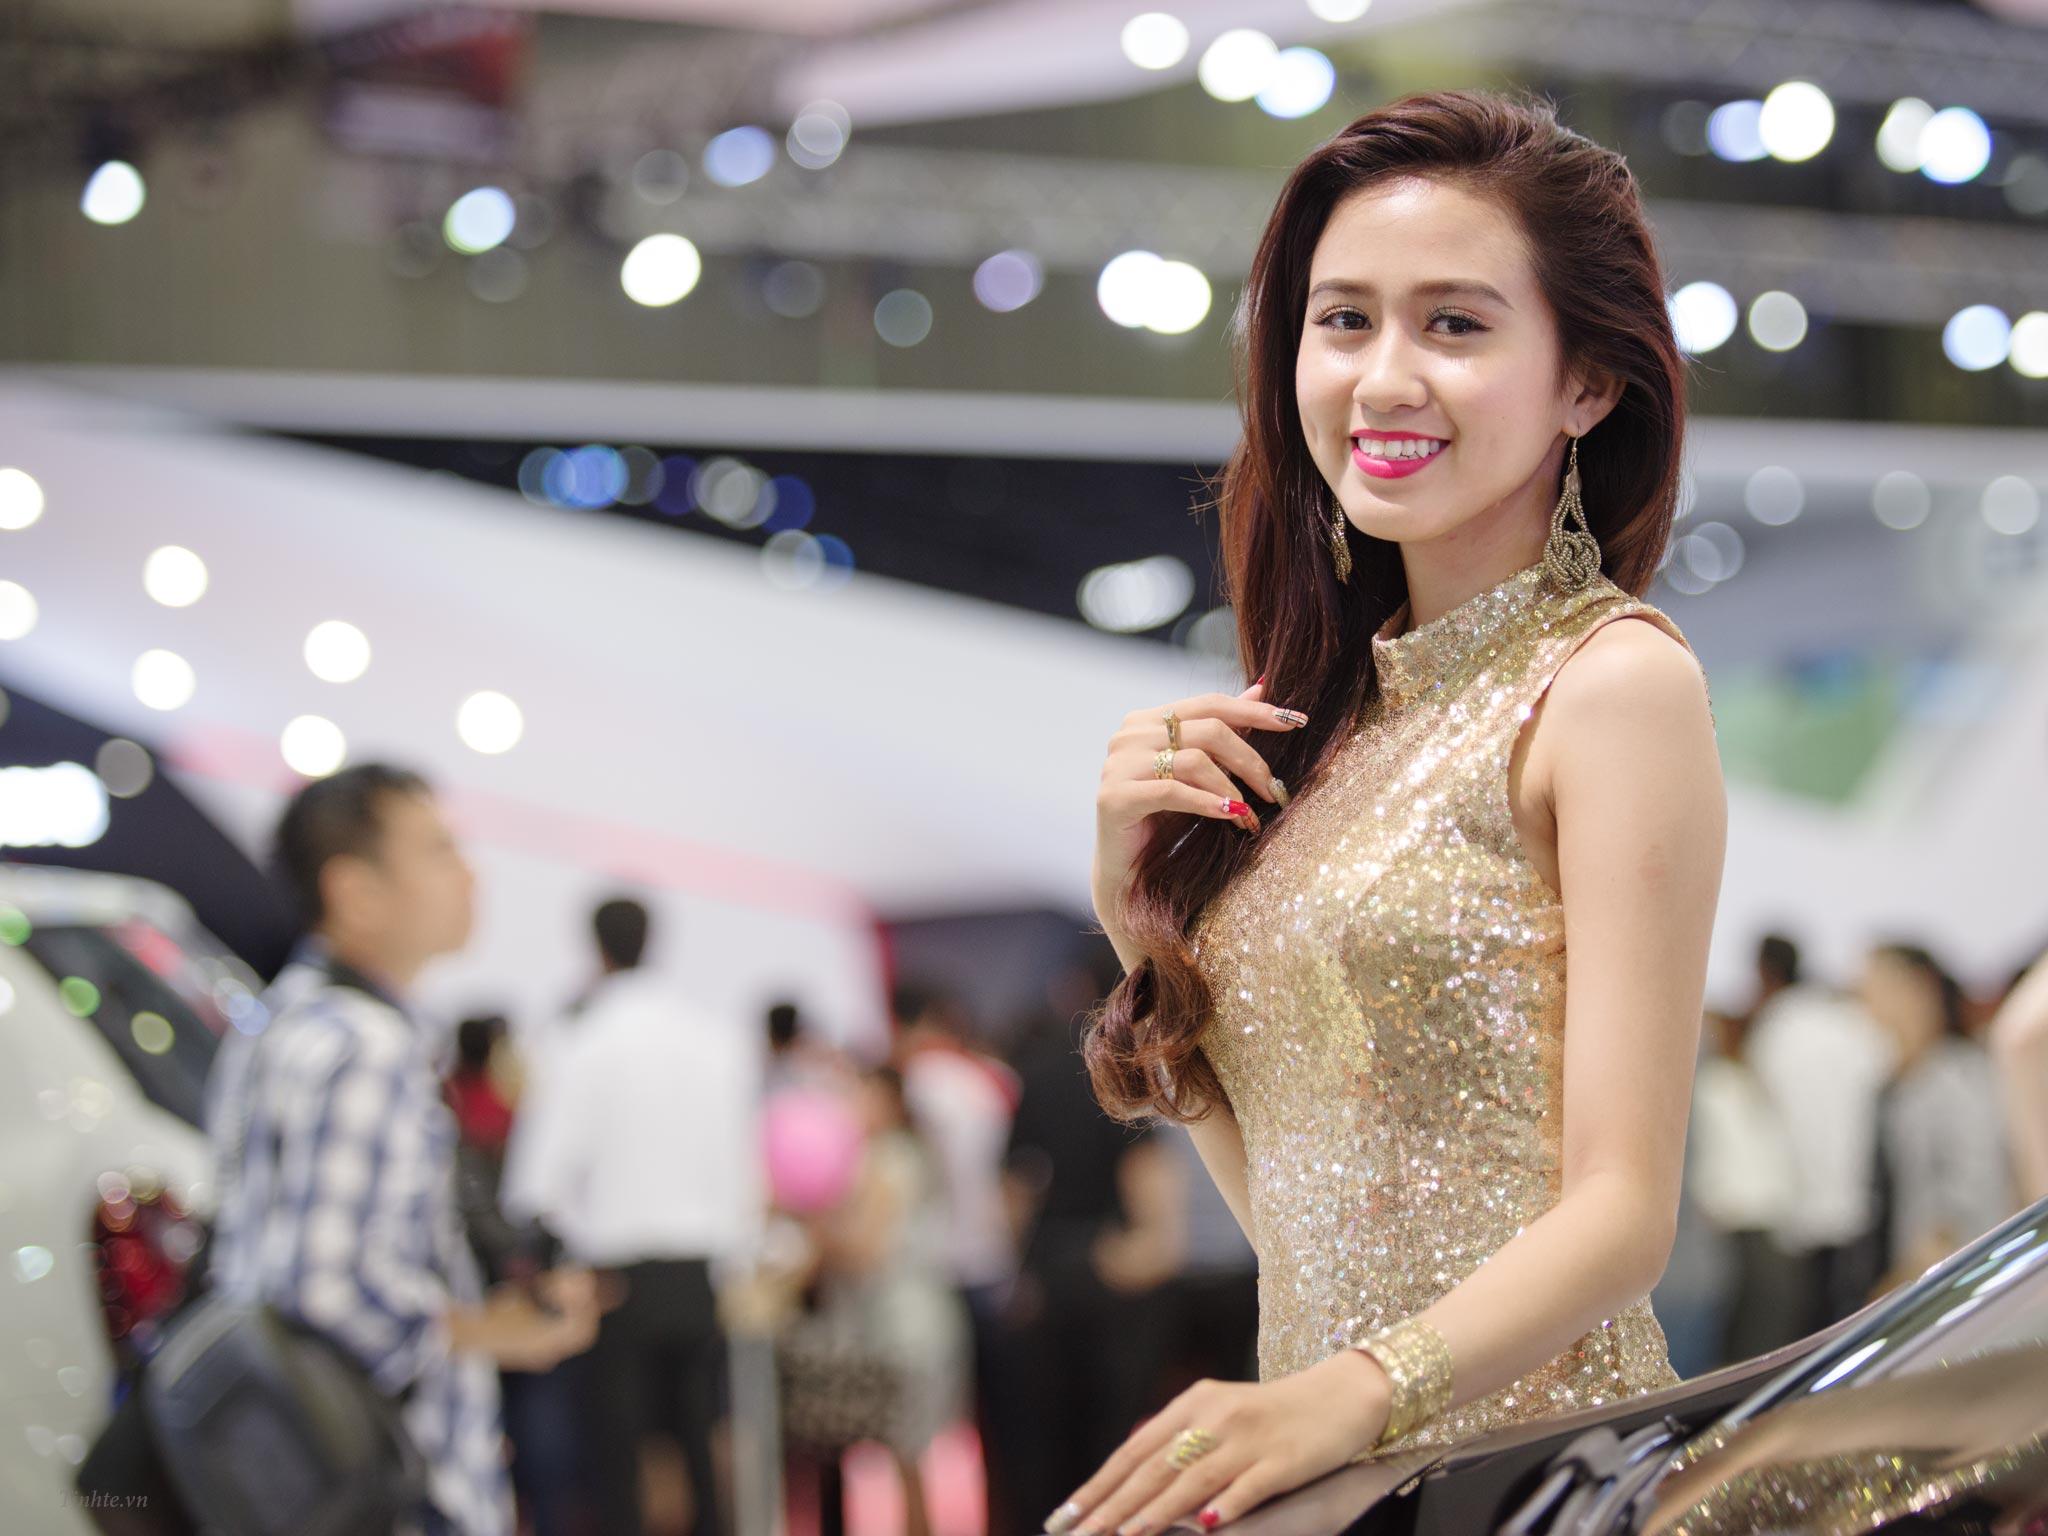 Lam_anh_sang_ro_trong_treo_hon_tinhte.vn_06.jpg